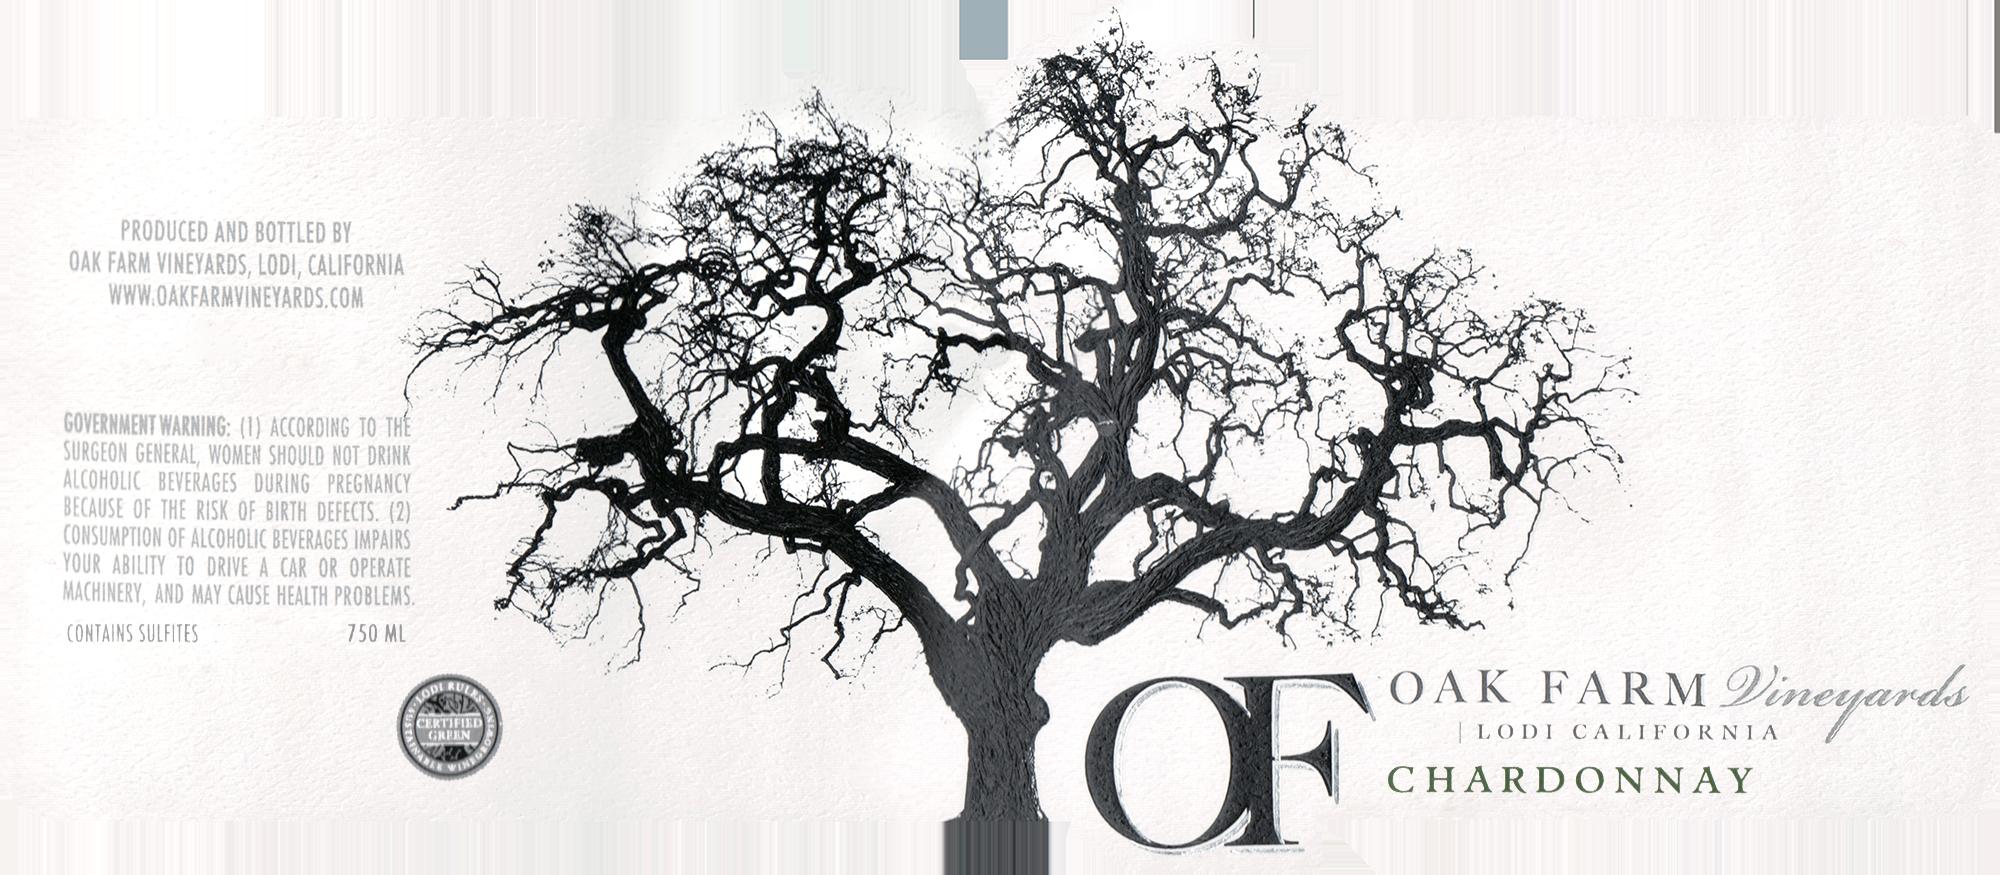 Oak Farm Vineyards Chardonnay Lodi 2018